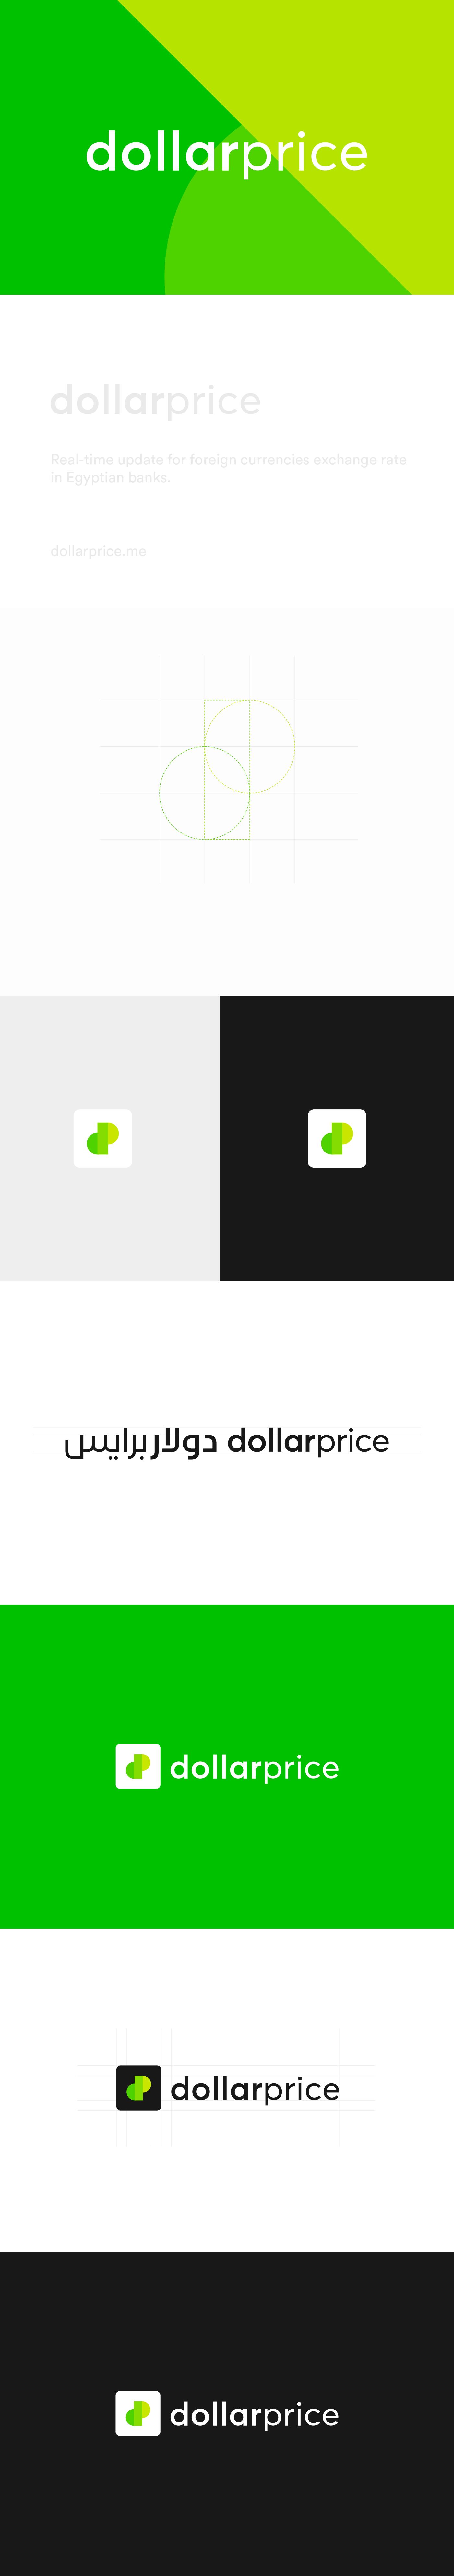 dollar price currency egypt Exchange Rate Egyptian banks Arabic logo